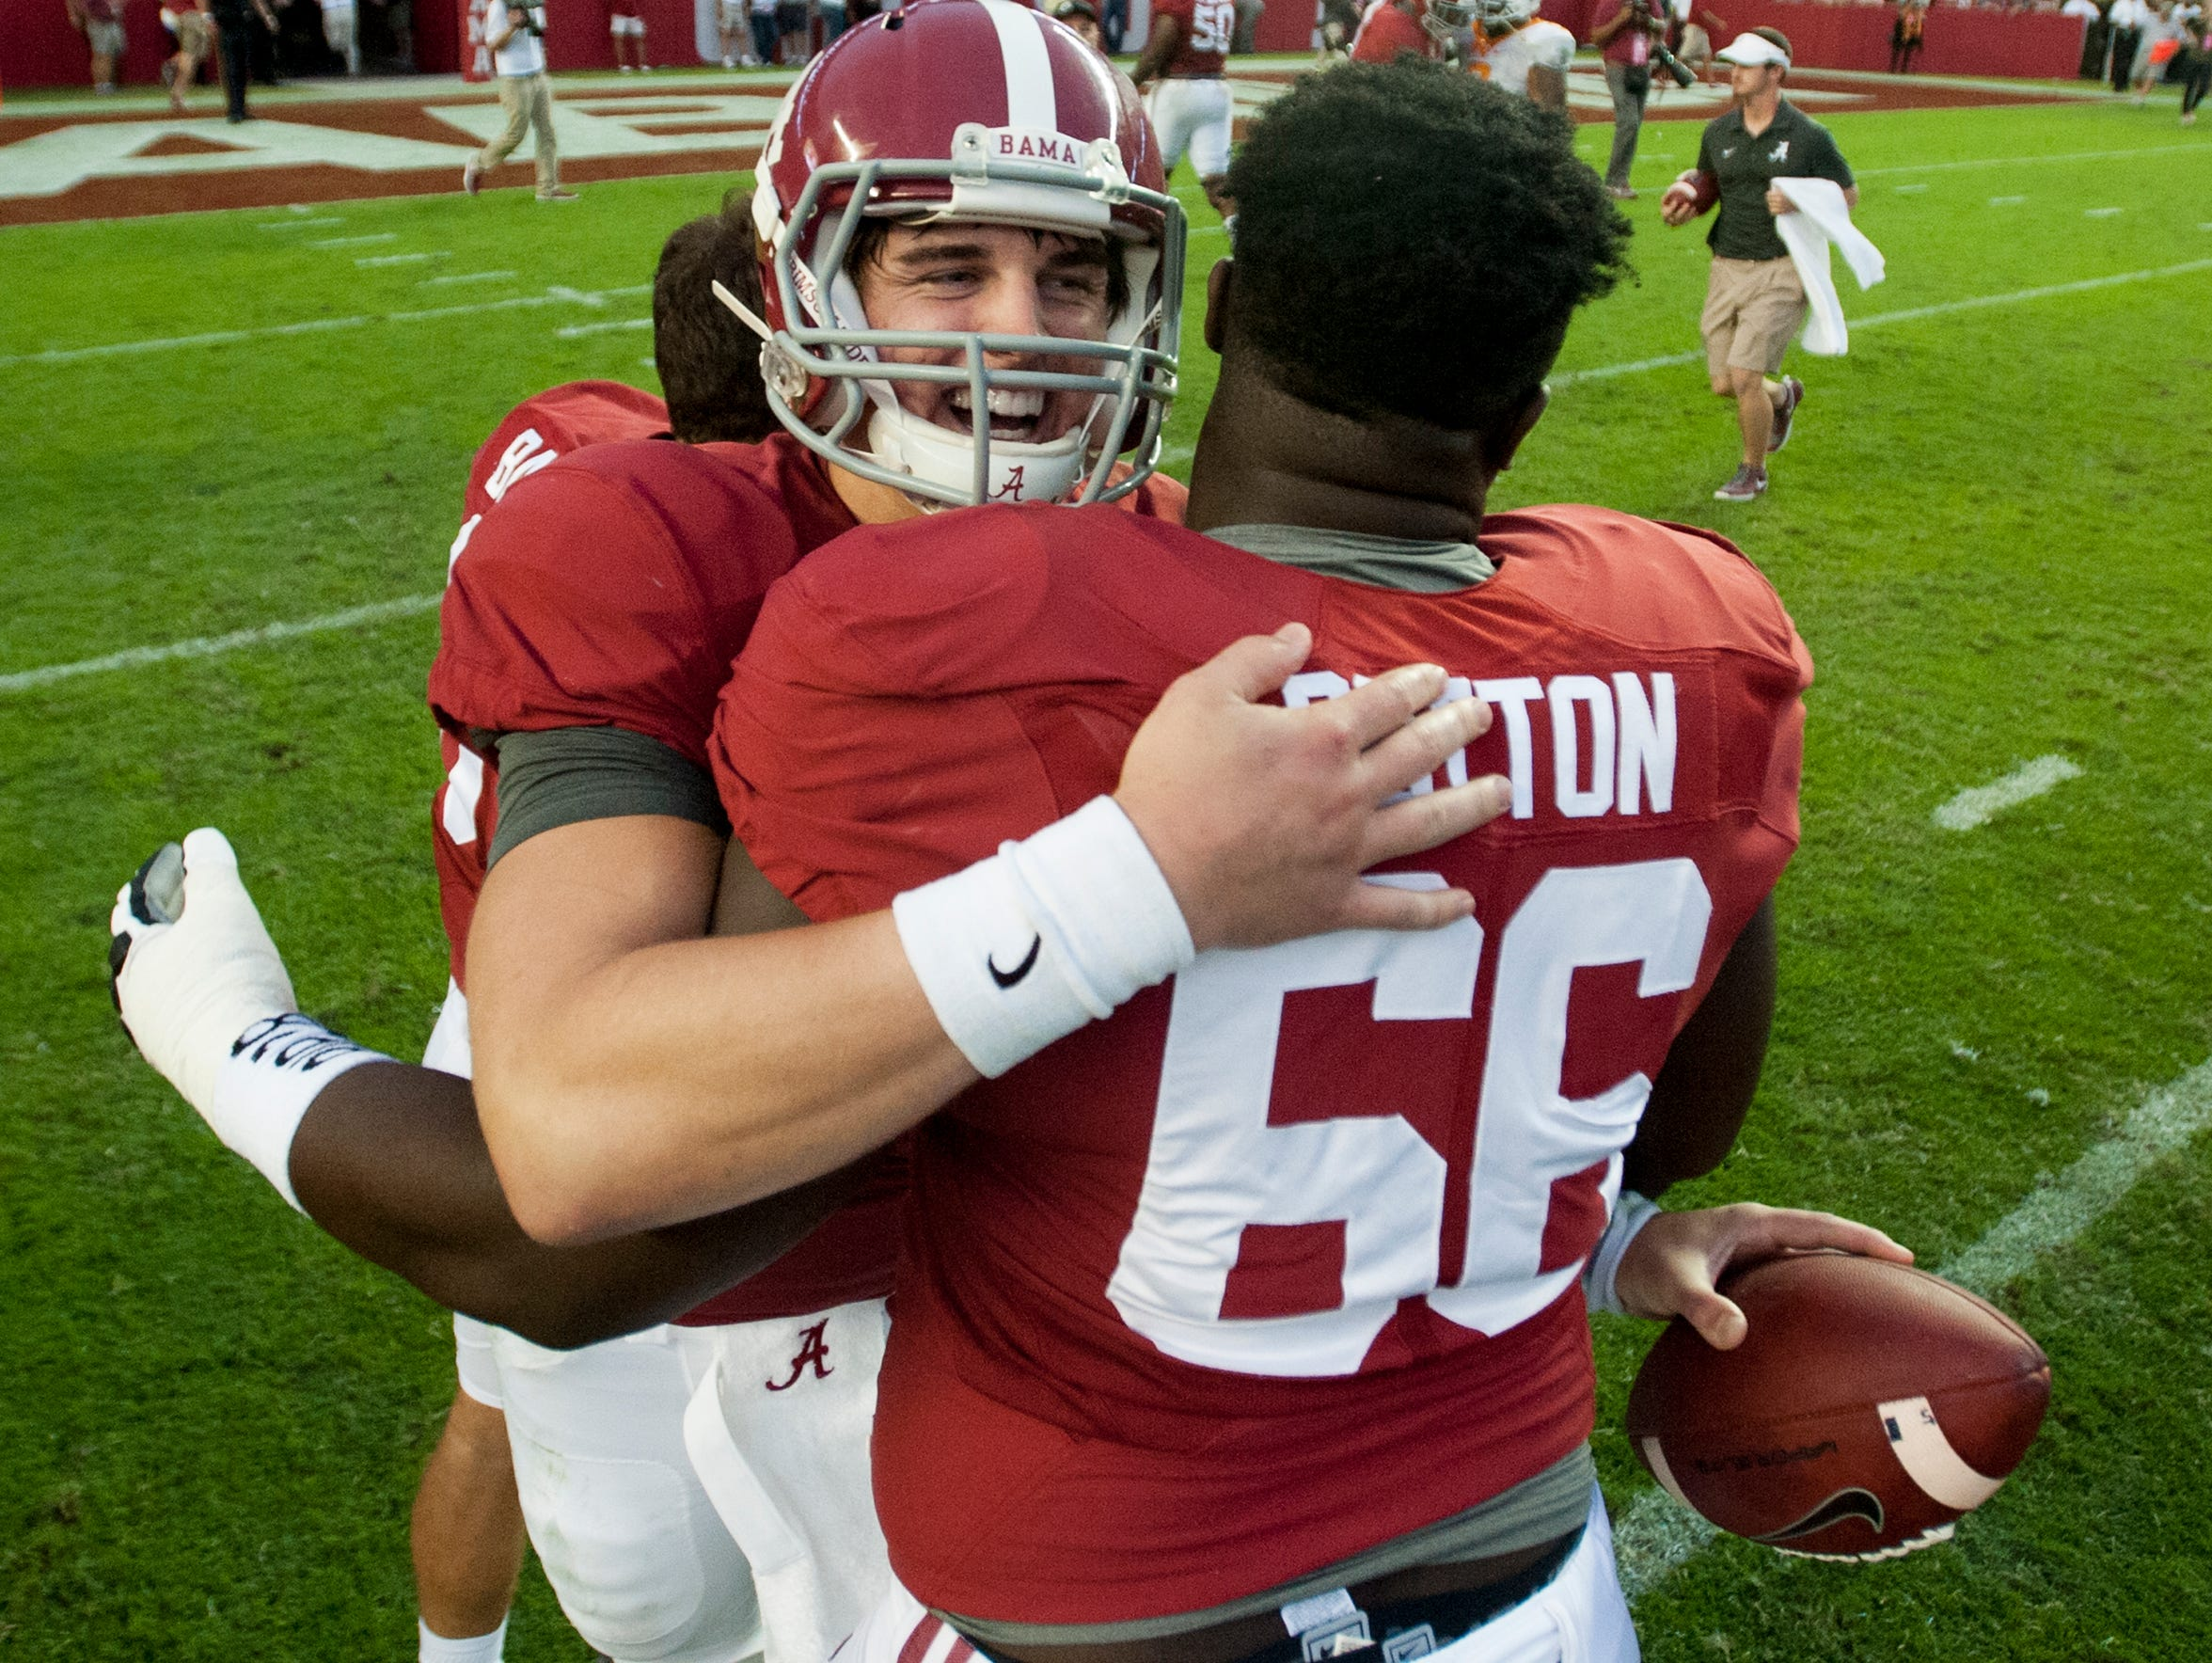 Alabama quarterback Jake Coker (14) celebrates with